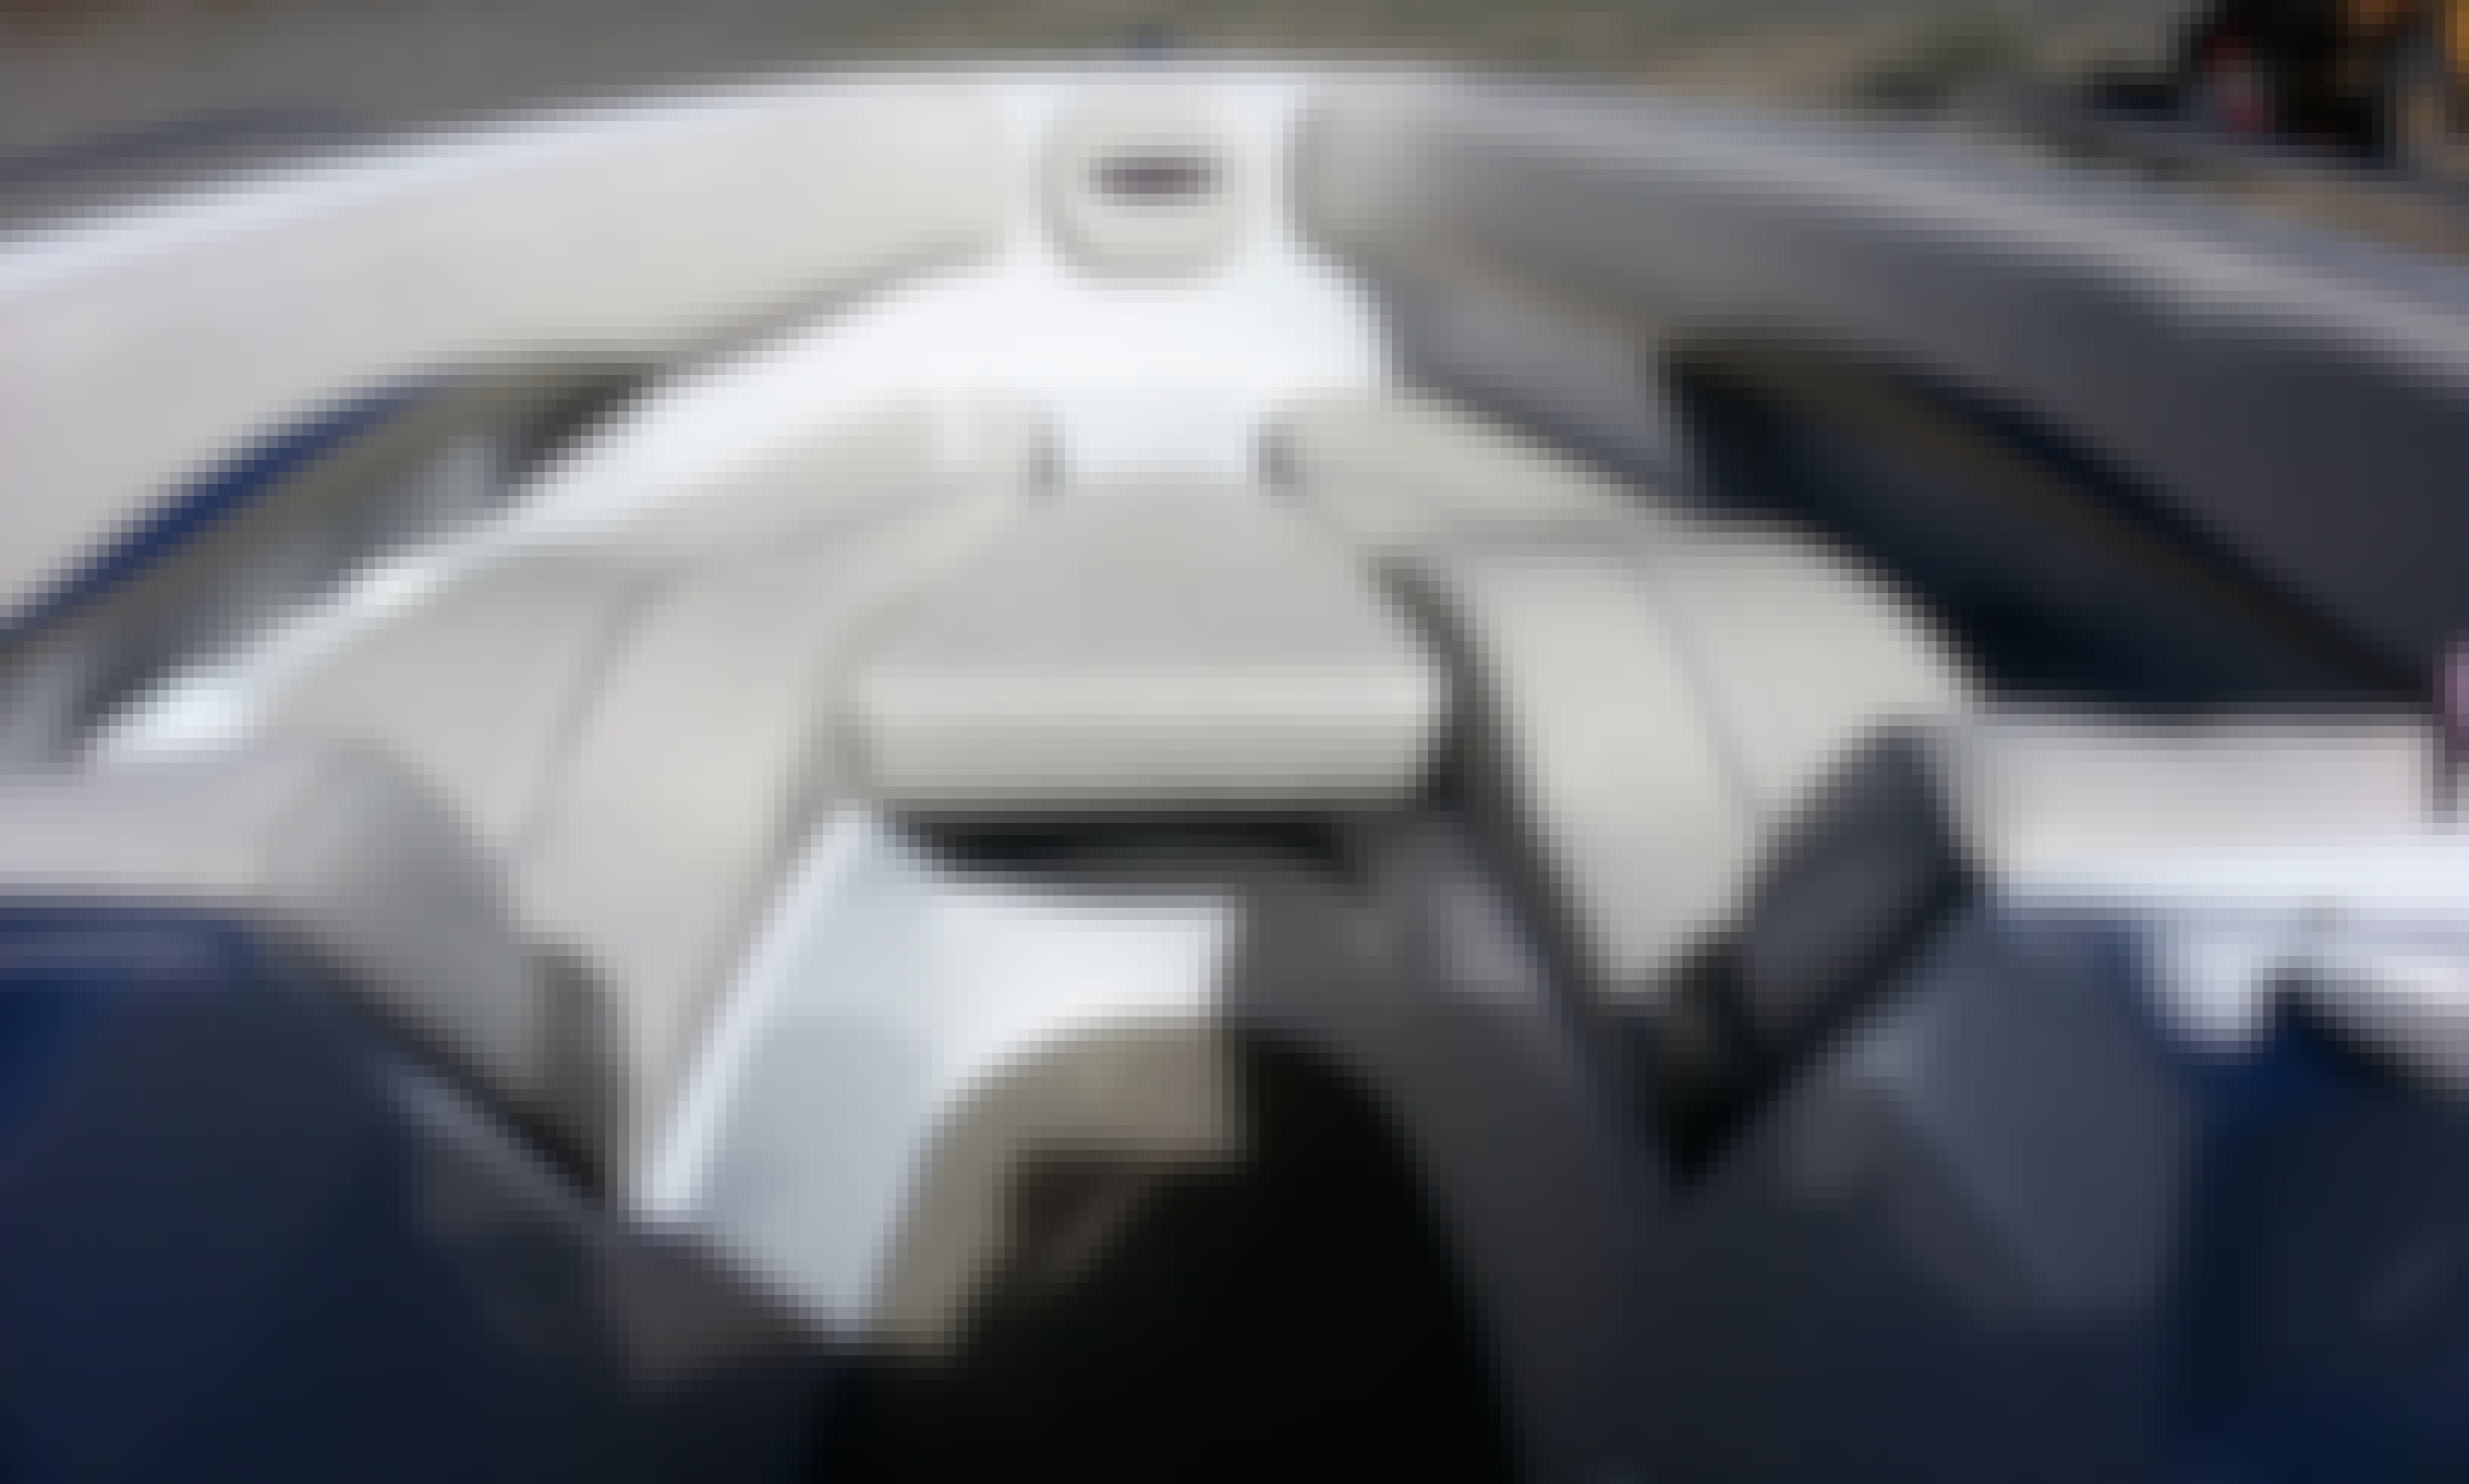 24' Four Winns V8 Bowrider Rental In Incline Village, Nevada